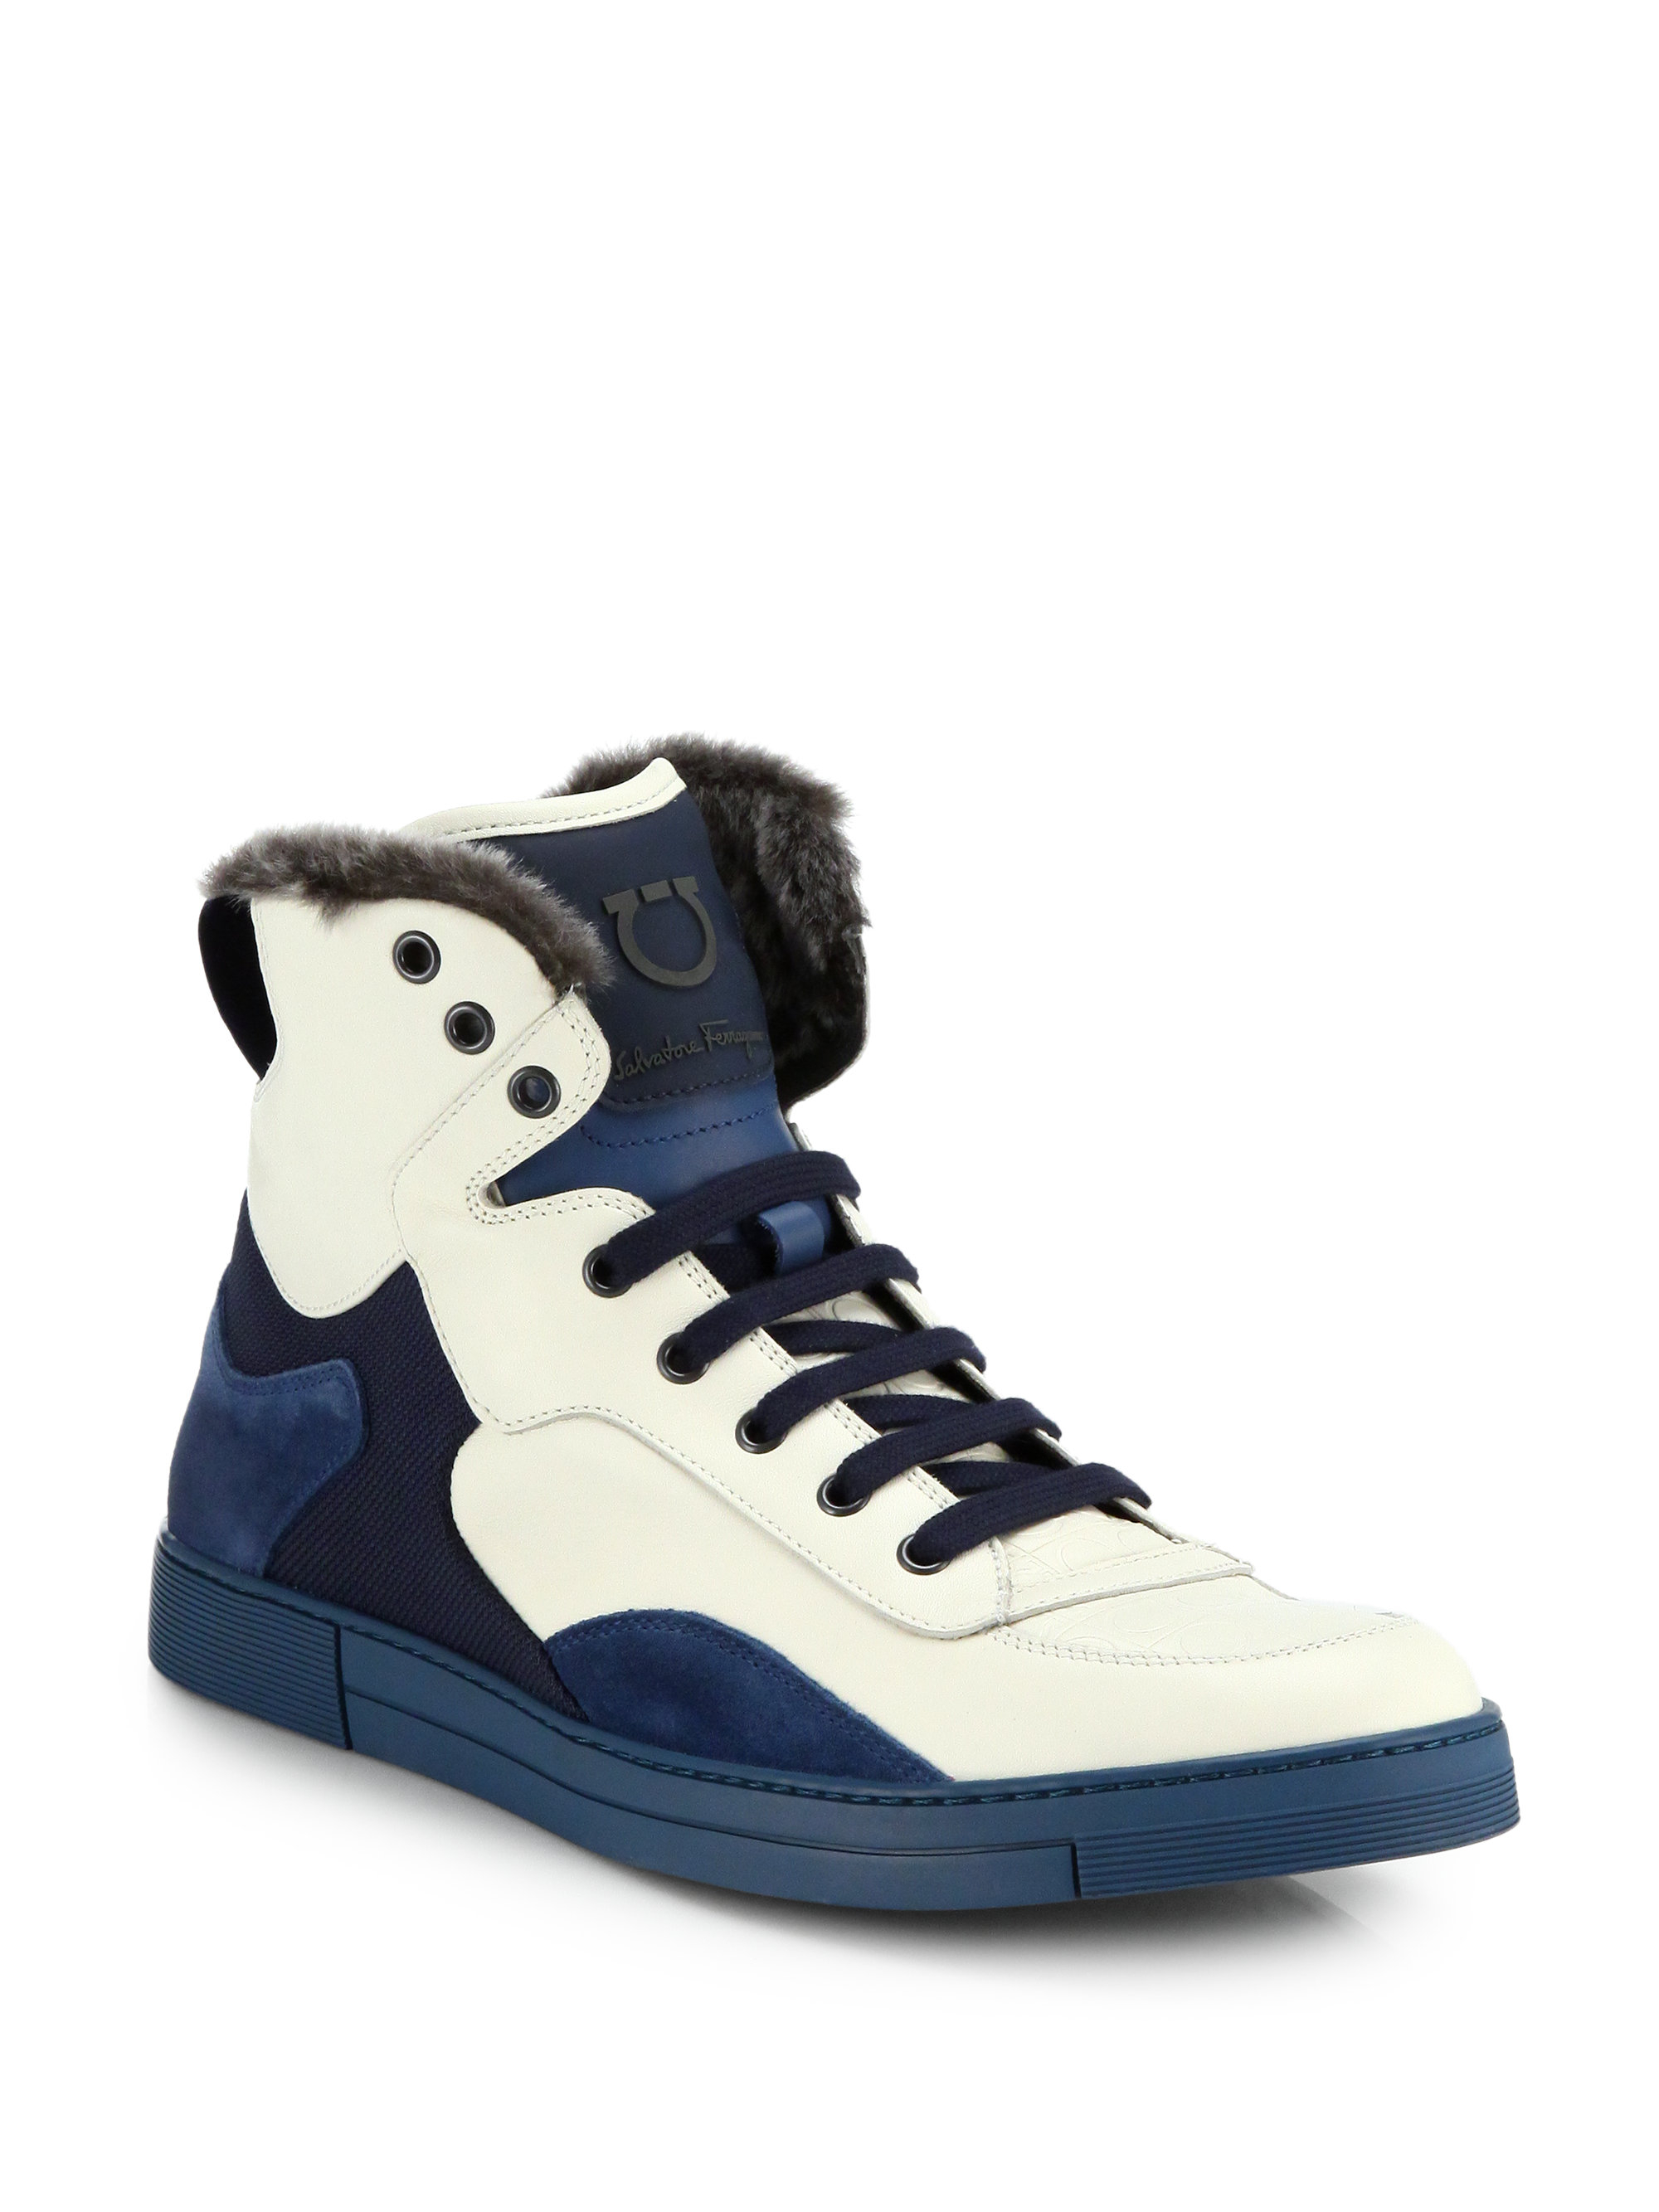 ferragamo suede leather shearling hightop sneakers in blue